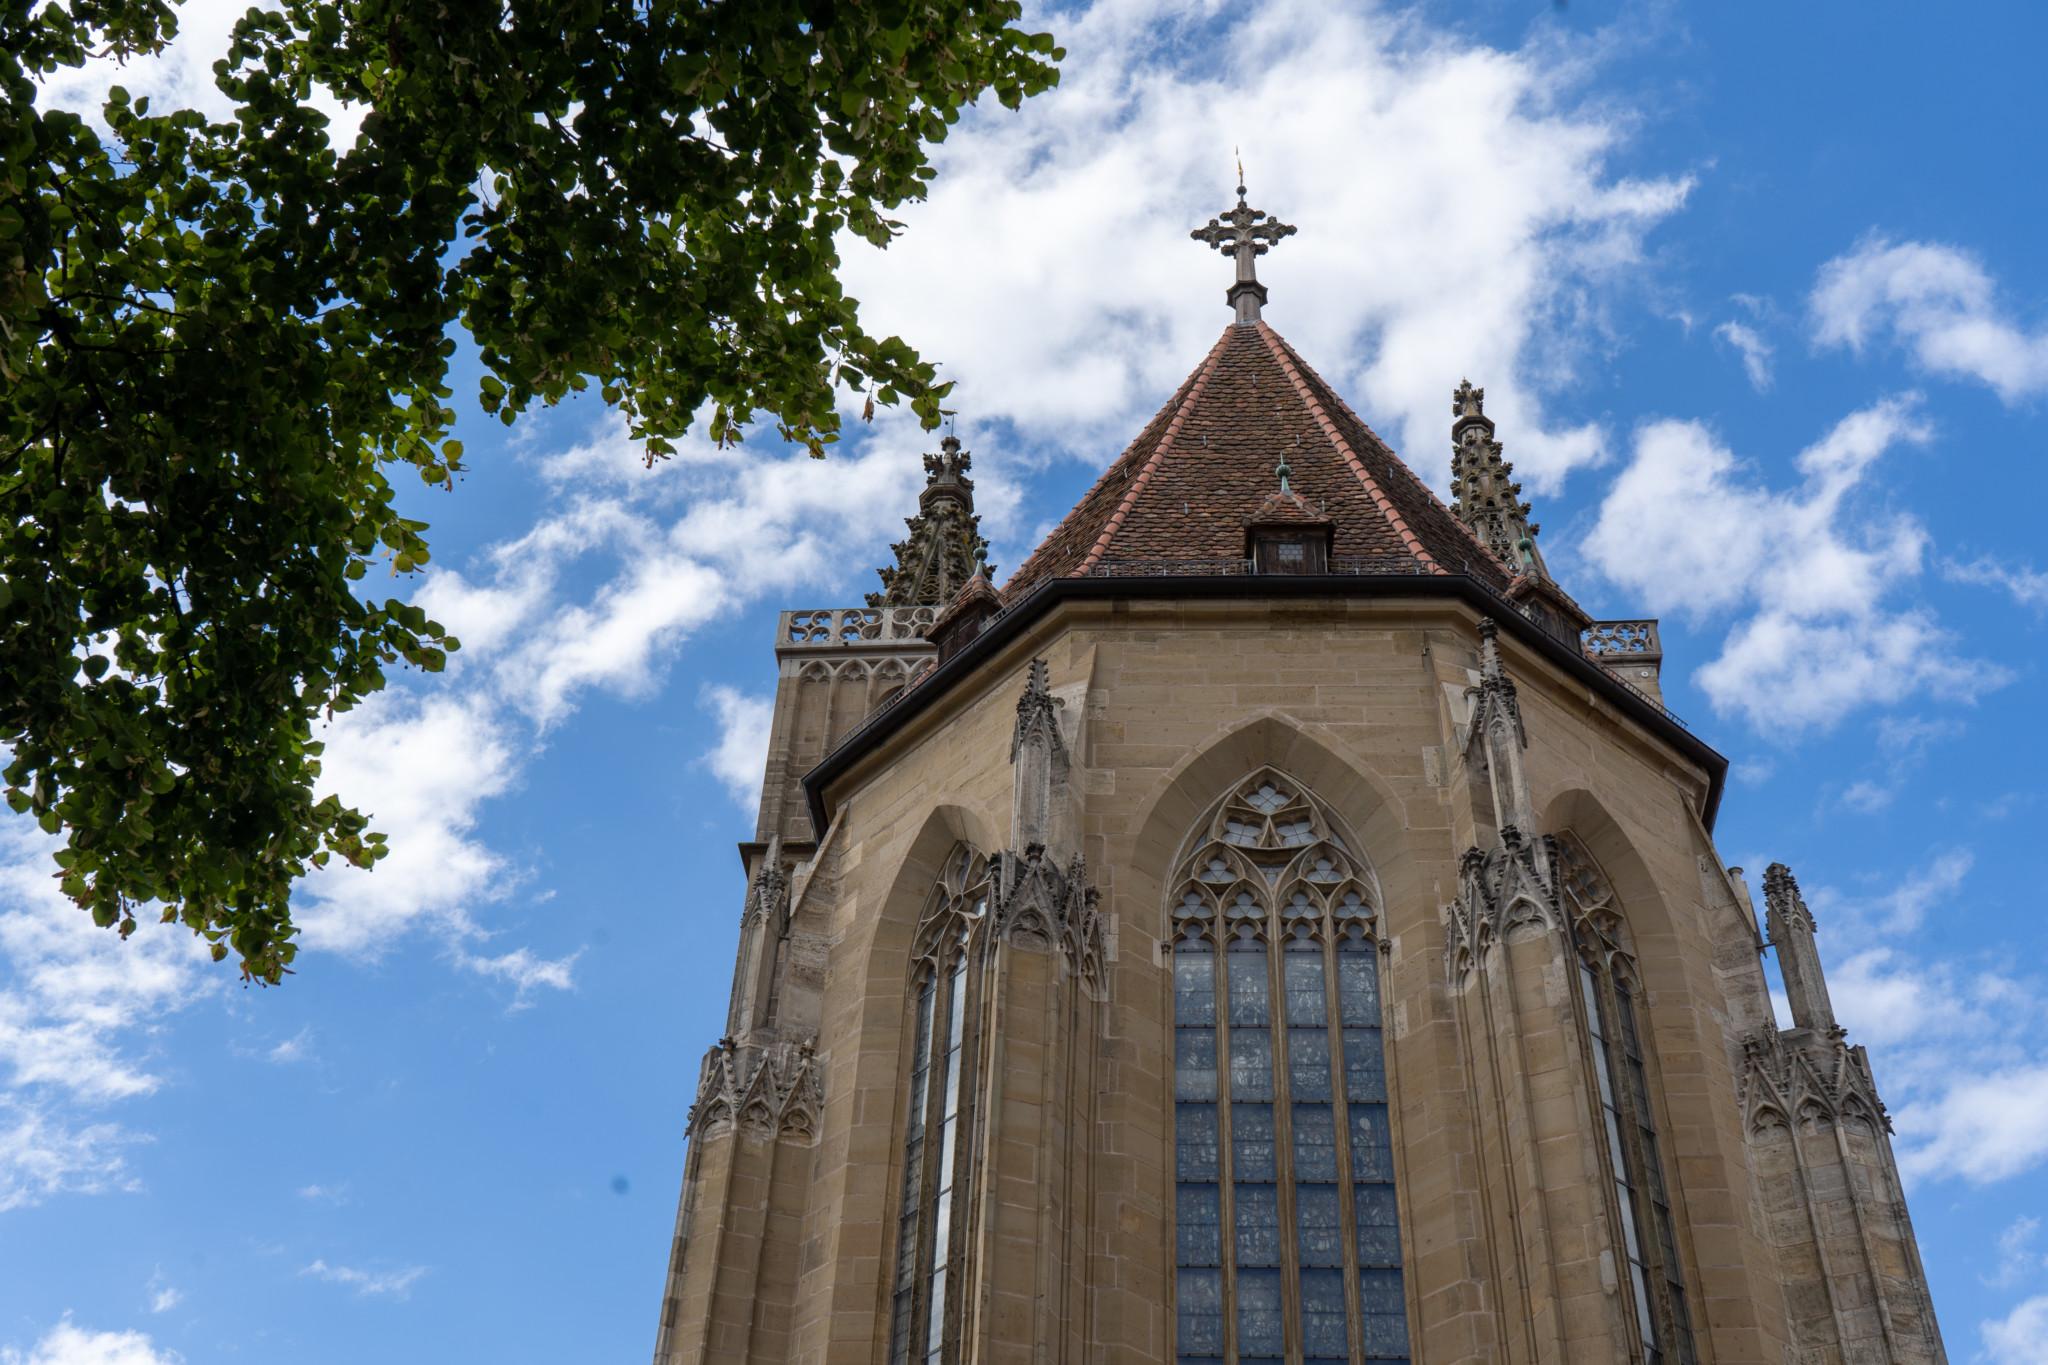 St. Jakobskirche in Rothenburg